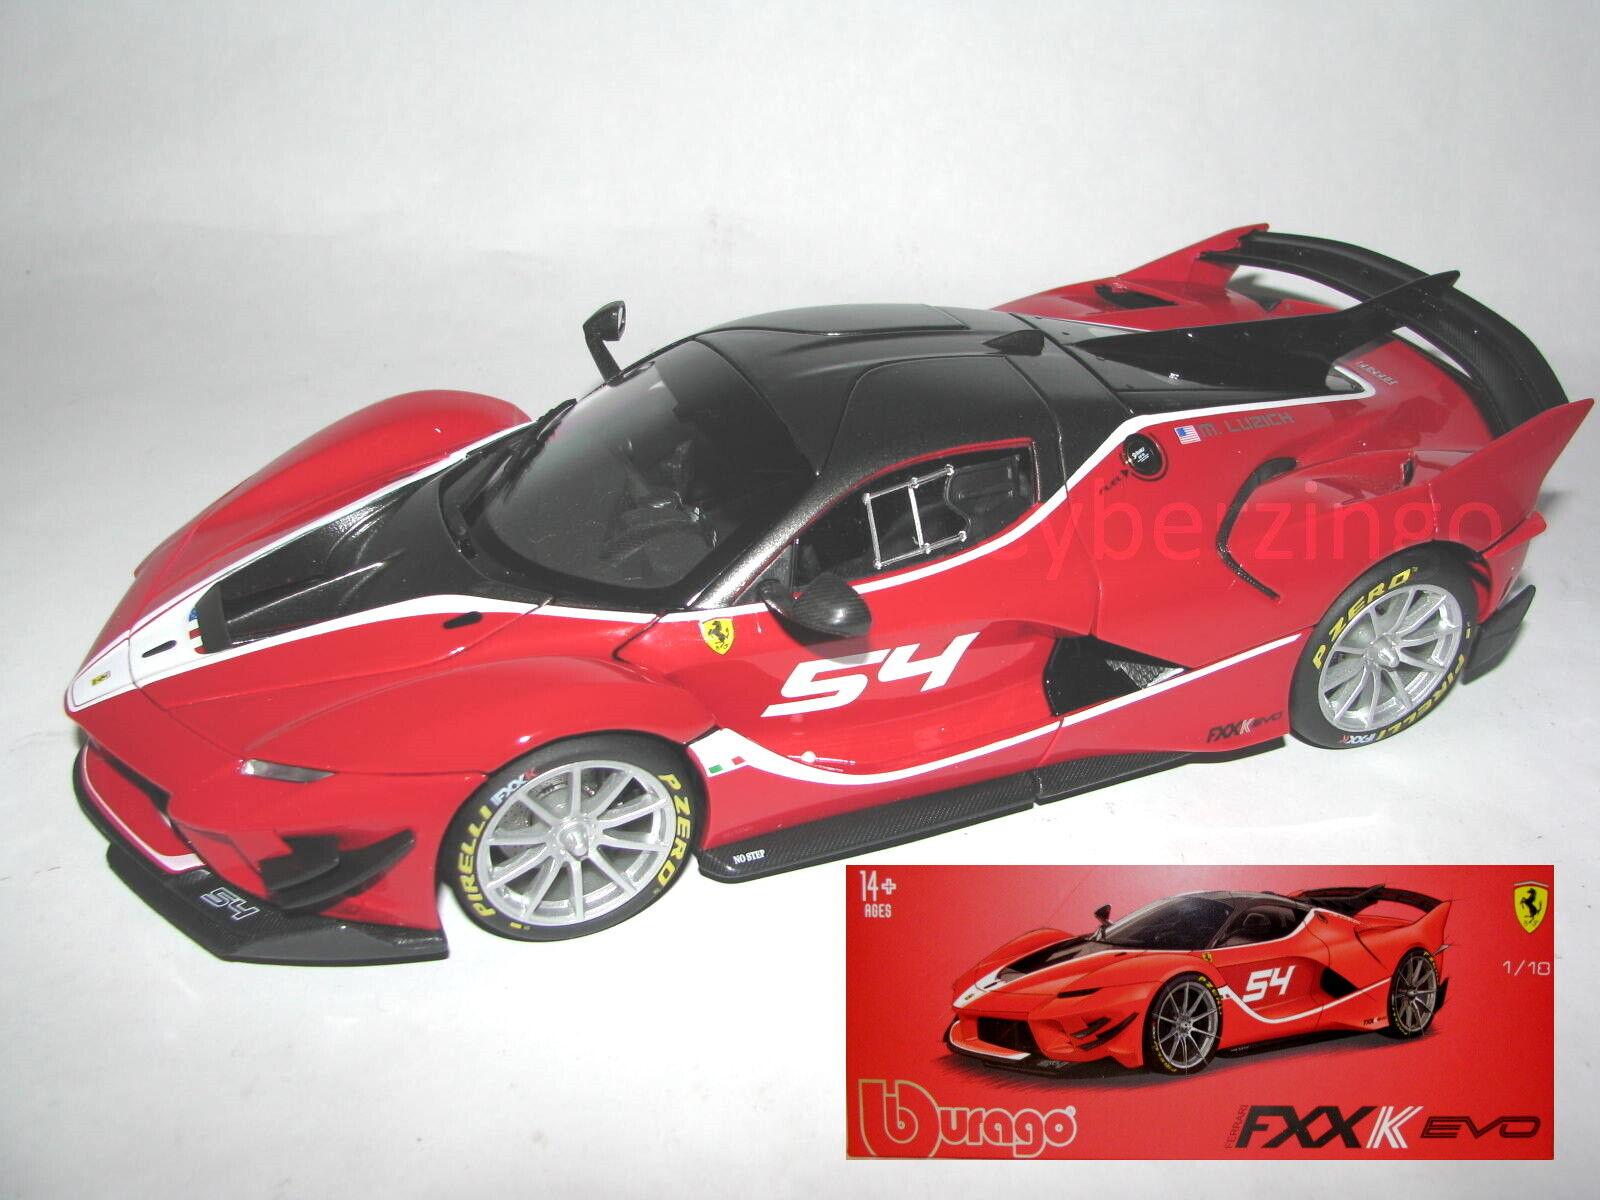 Ferrari Fxxk Evo 54 Luzich Bburago 1 18 Red Diecast Model Car Fxx K New In Box 4893993169085 Ebay